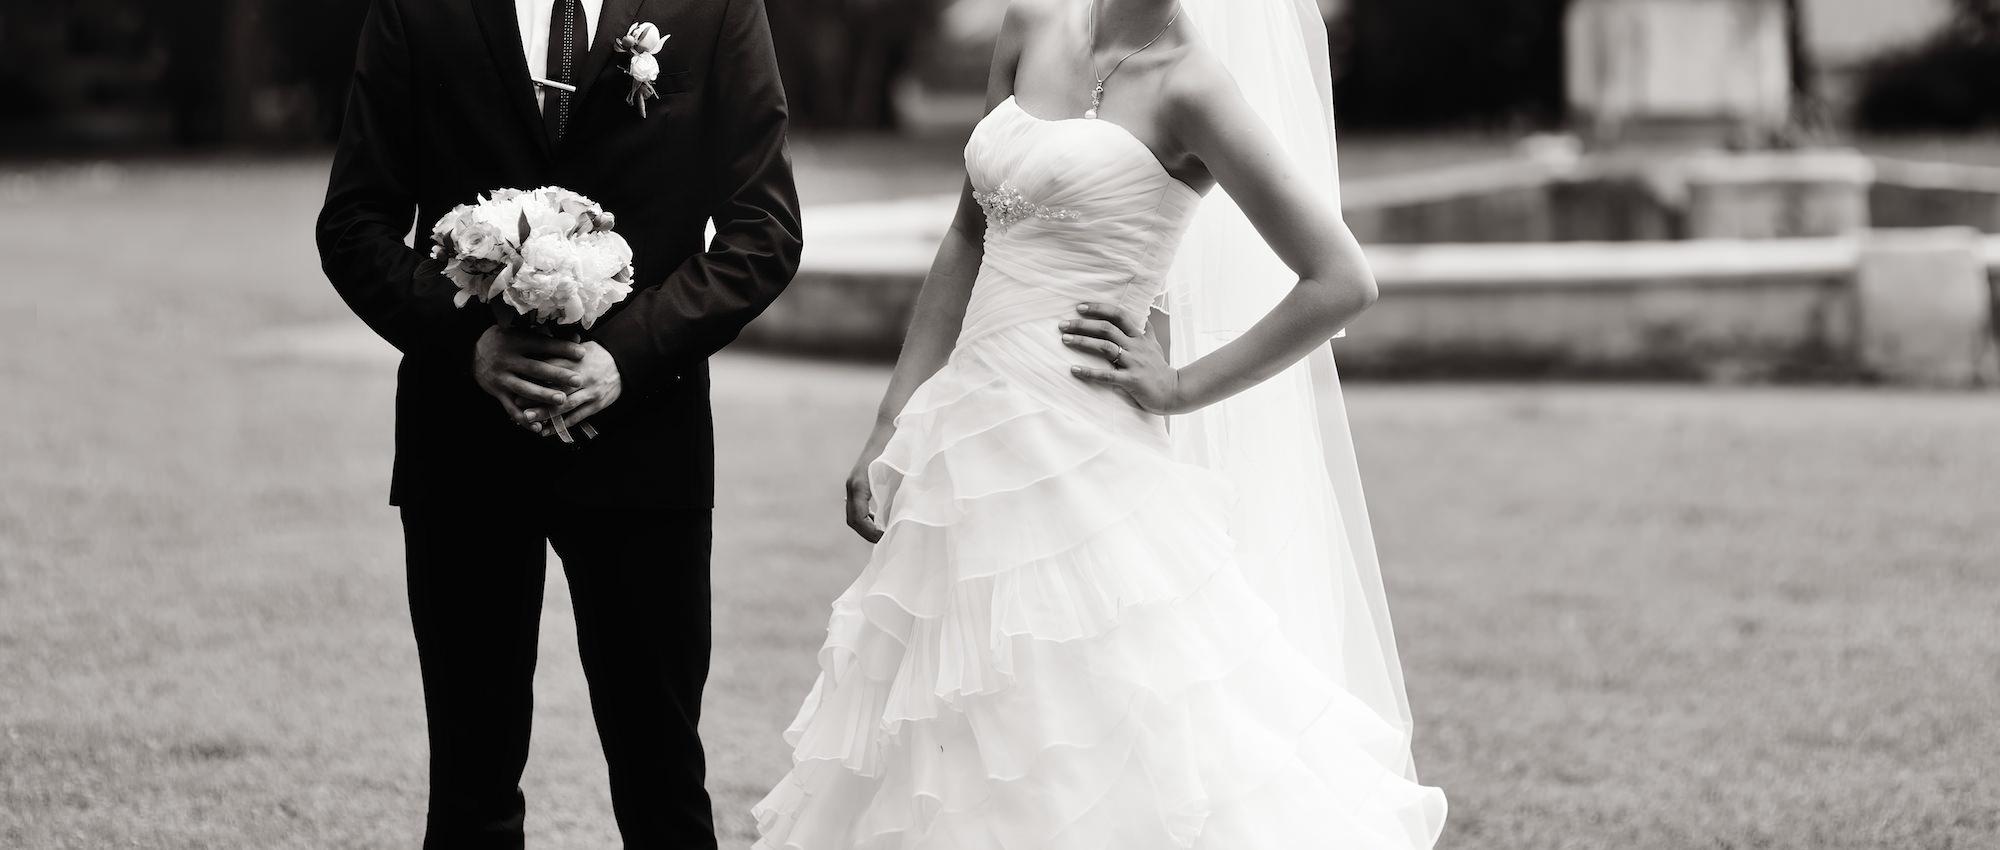 Rencontrer homme pour mariage